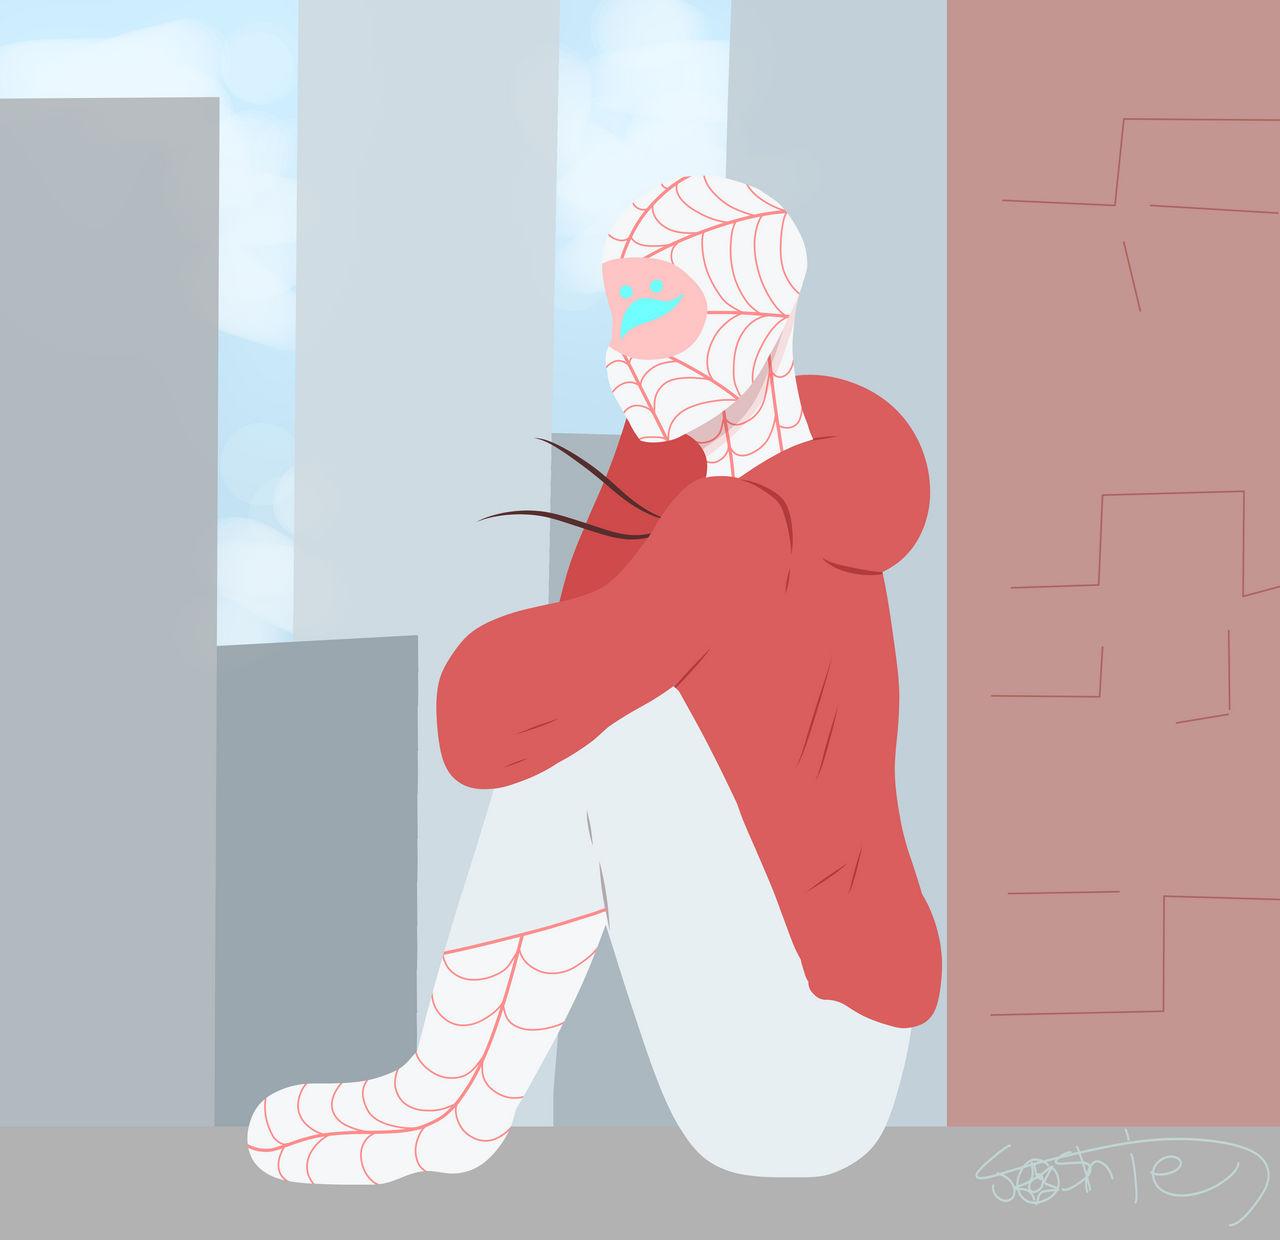 [Spidersona] City Sounds by joshiepopop